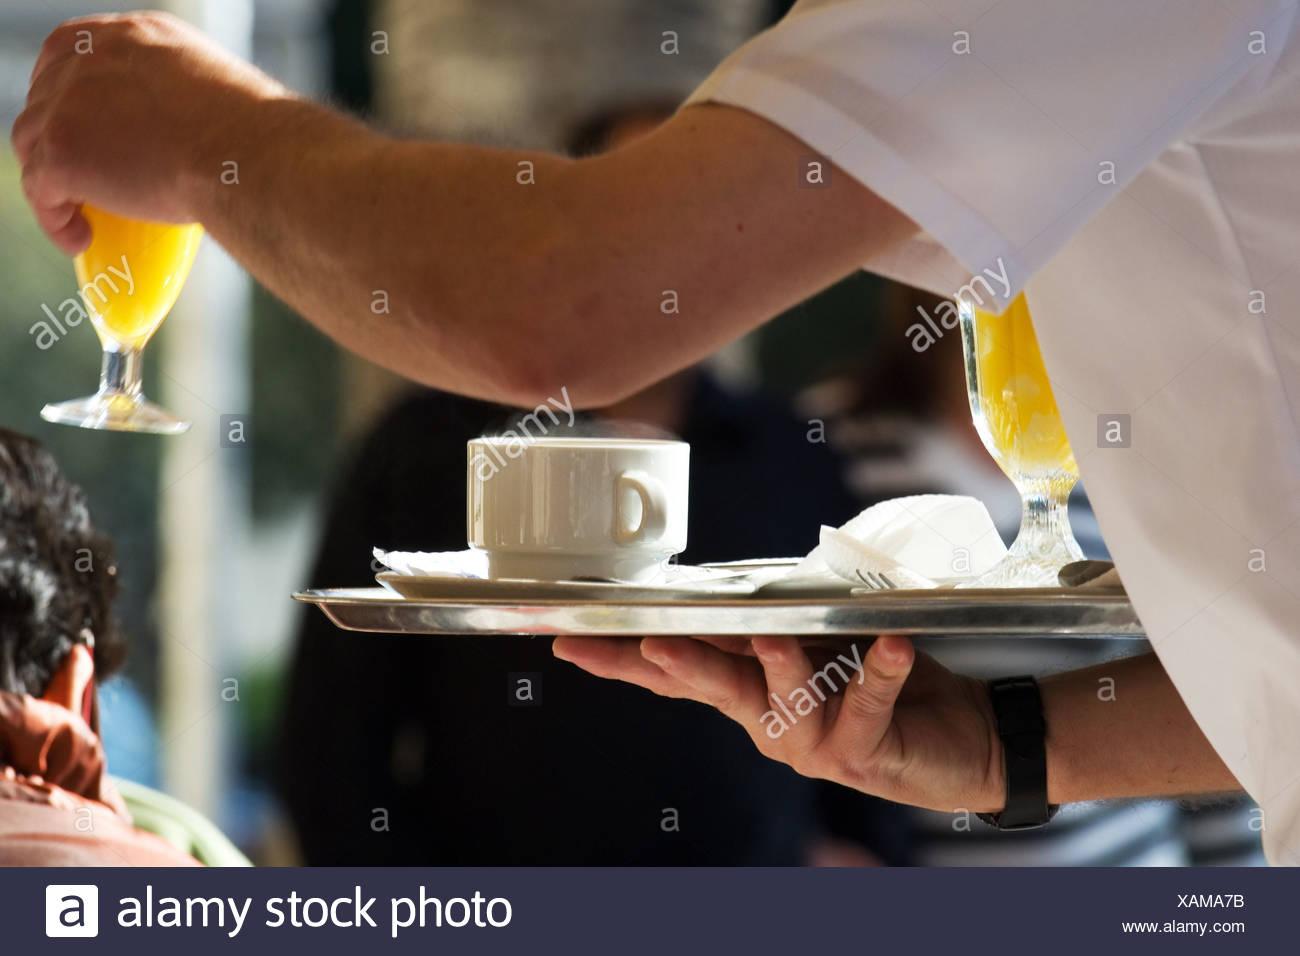 waiter serves orangejuice - Stock Image